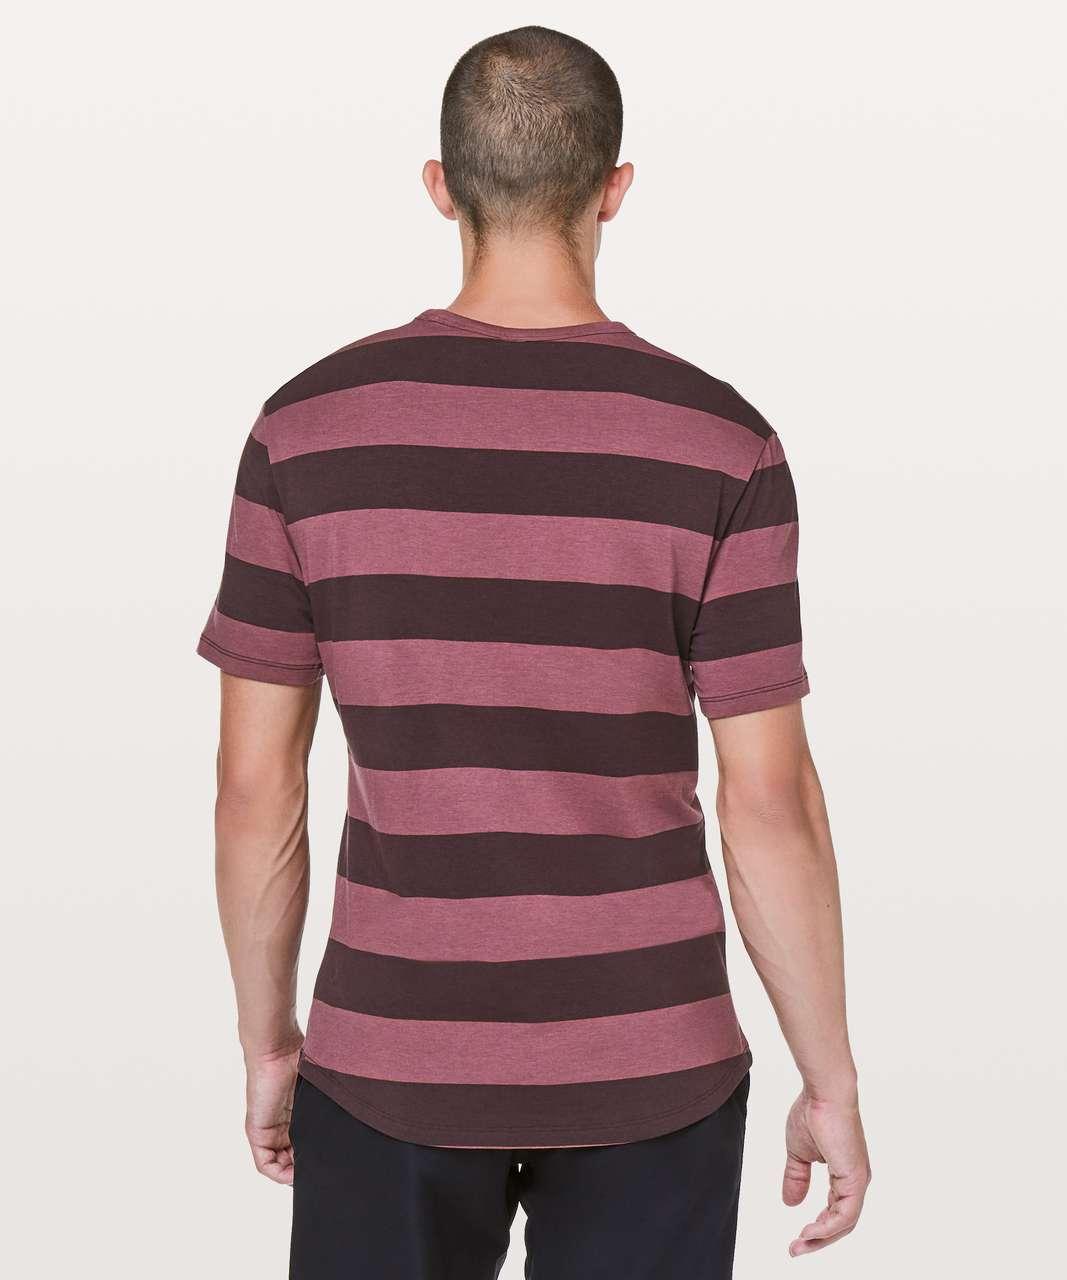 Lululemon 5 Year Basic Tee *Updated Fit - Wide Bold Stripe Smoky Red Black Plum